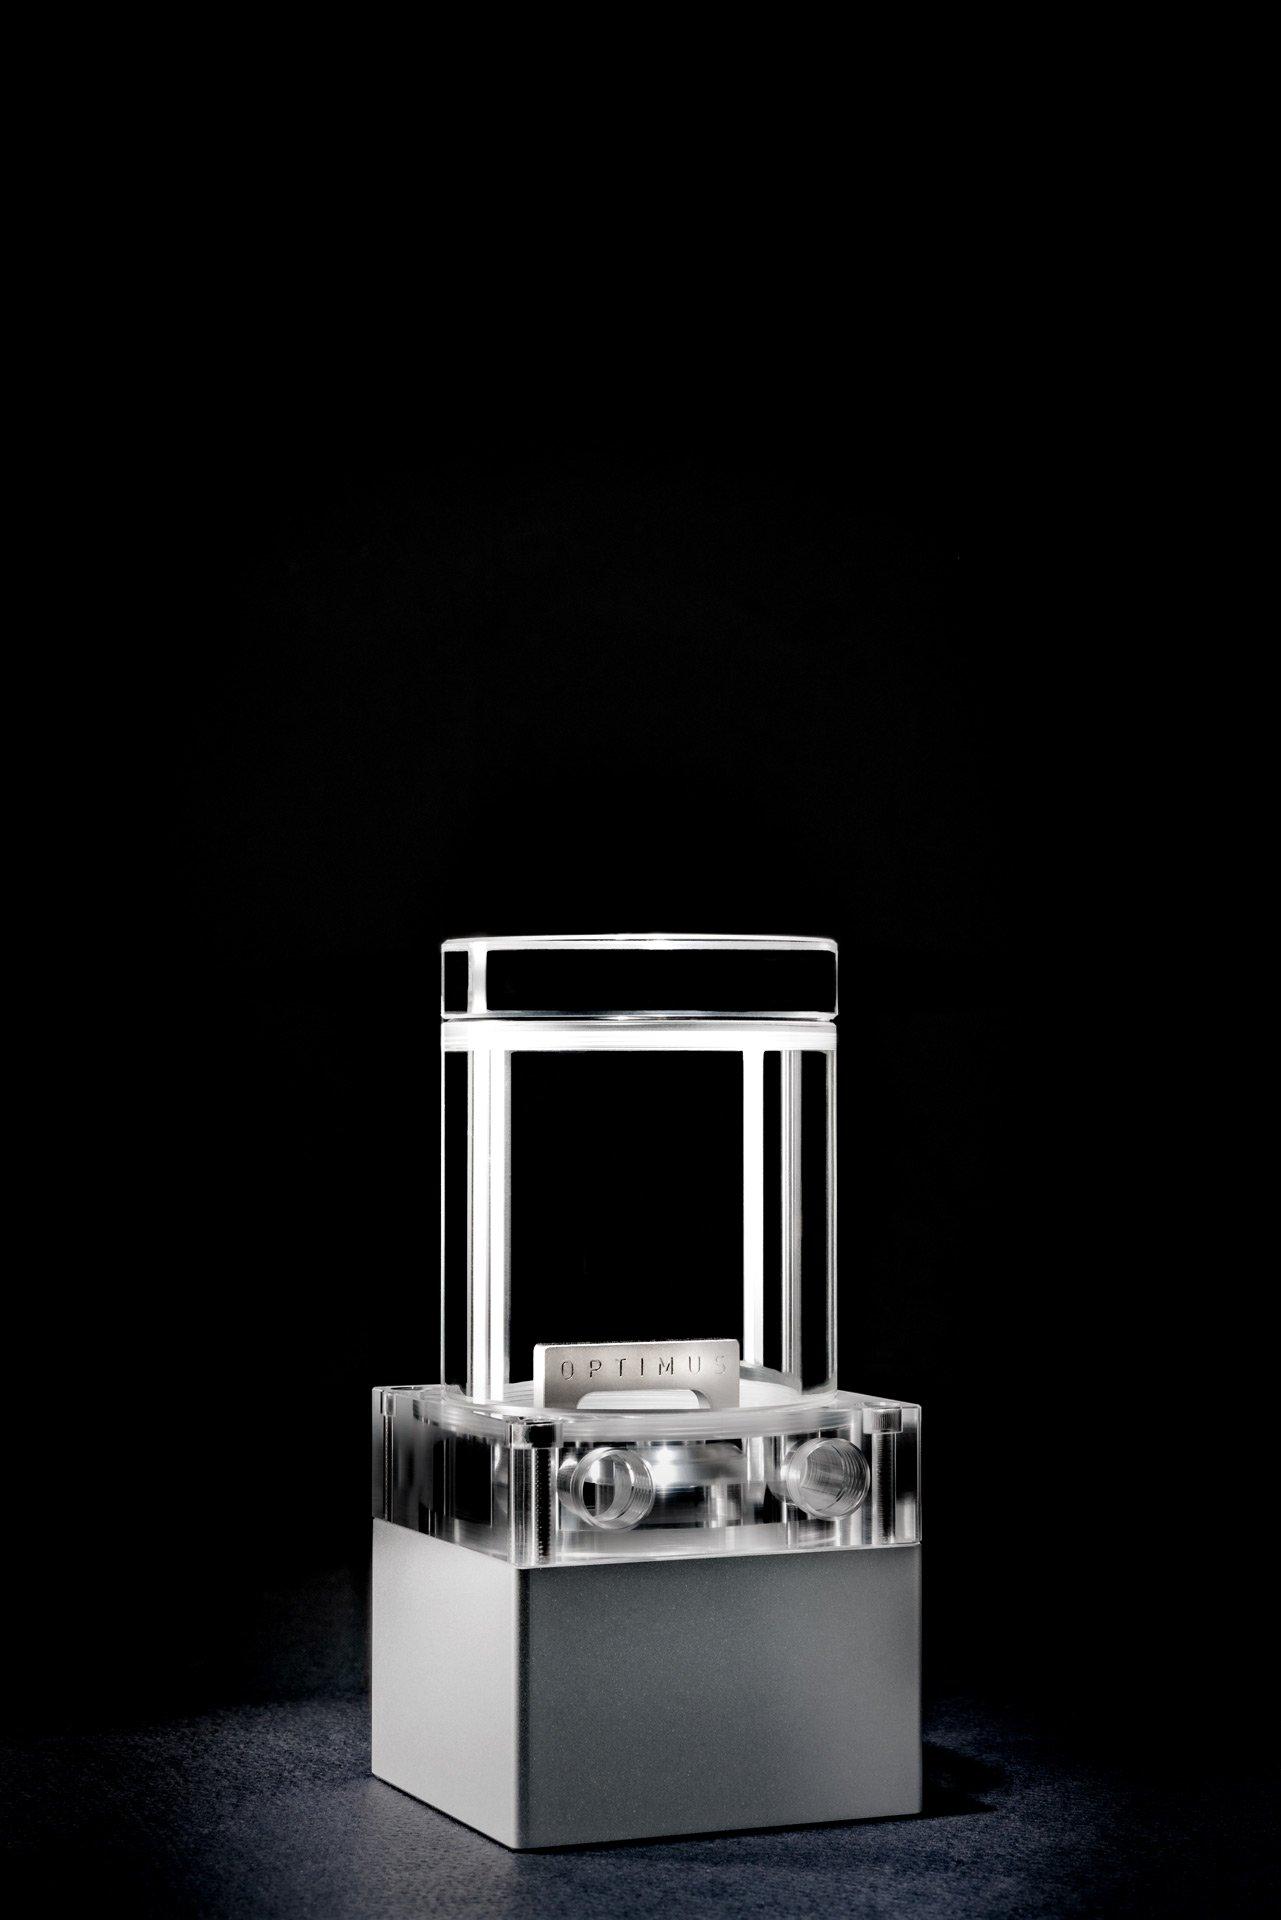 optimus-reservoir-d5-system-main-70mm-1_2000x.jpg